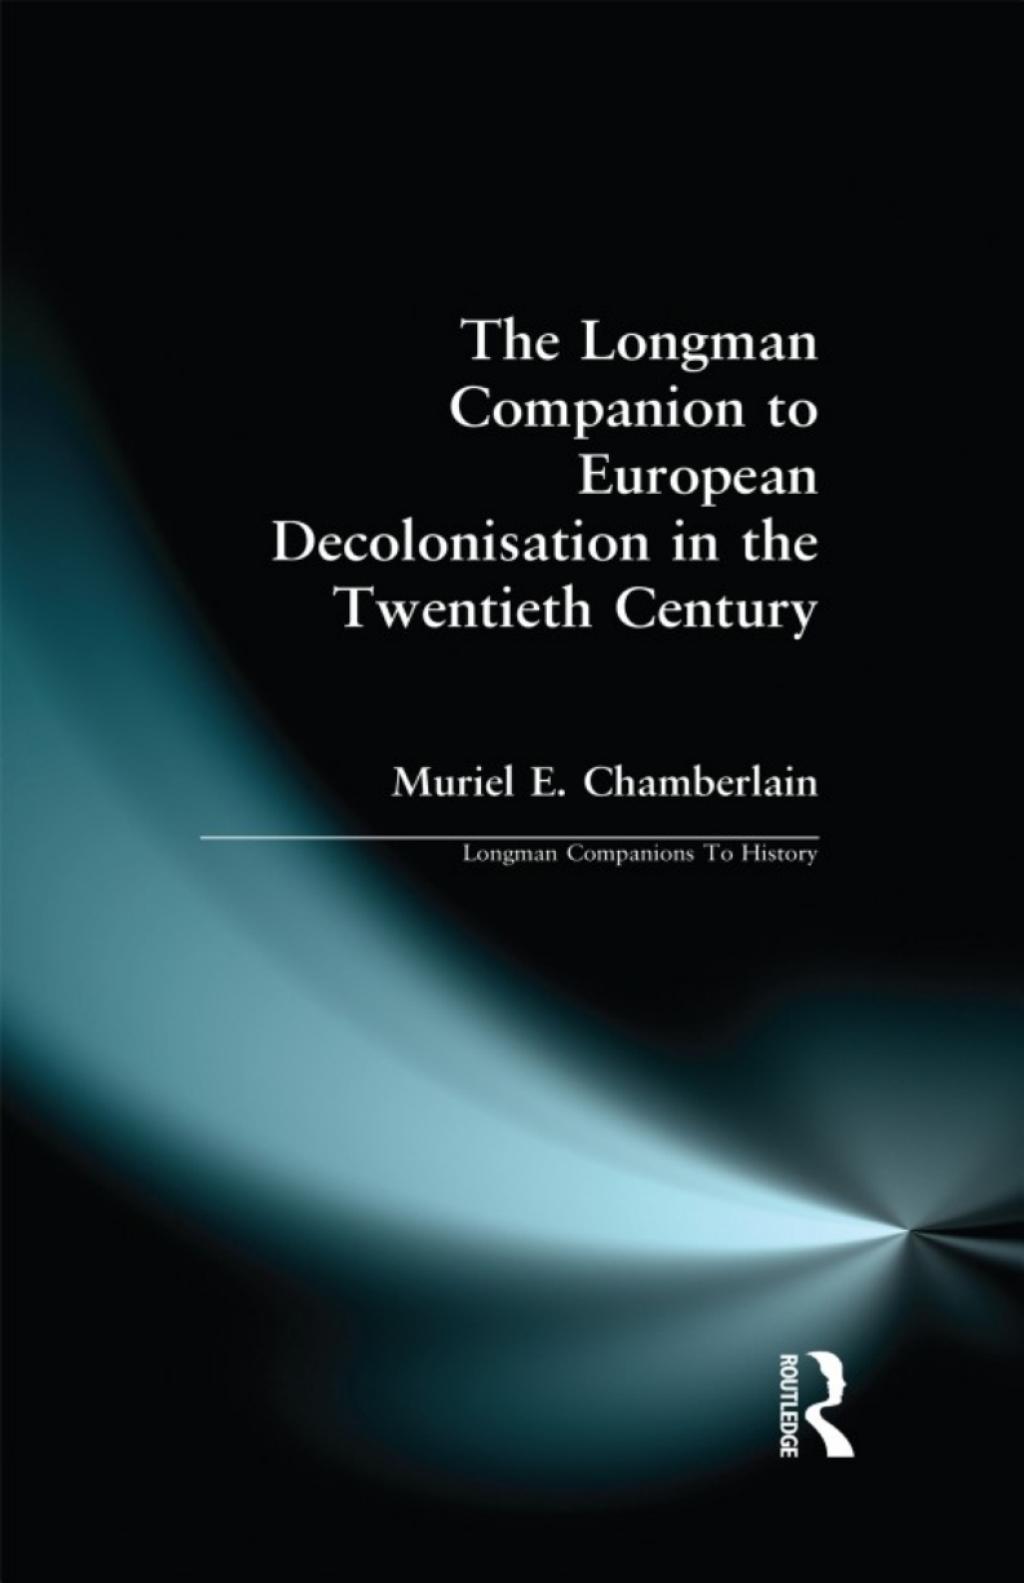 Longman Companion to European Decolonisation in the Twentieth Century (eBook)